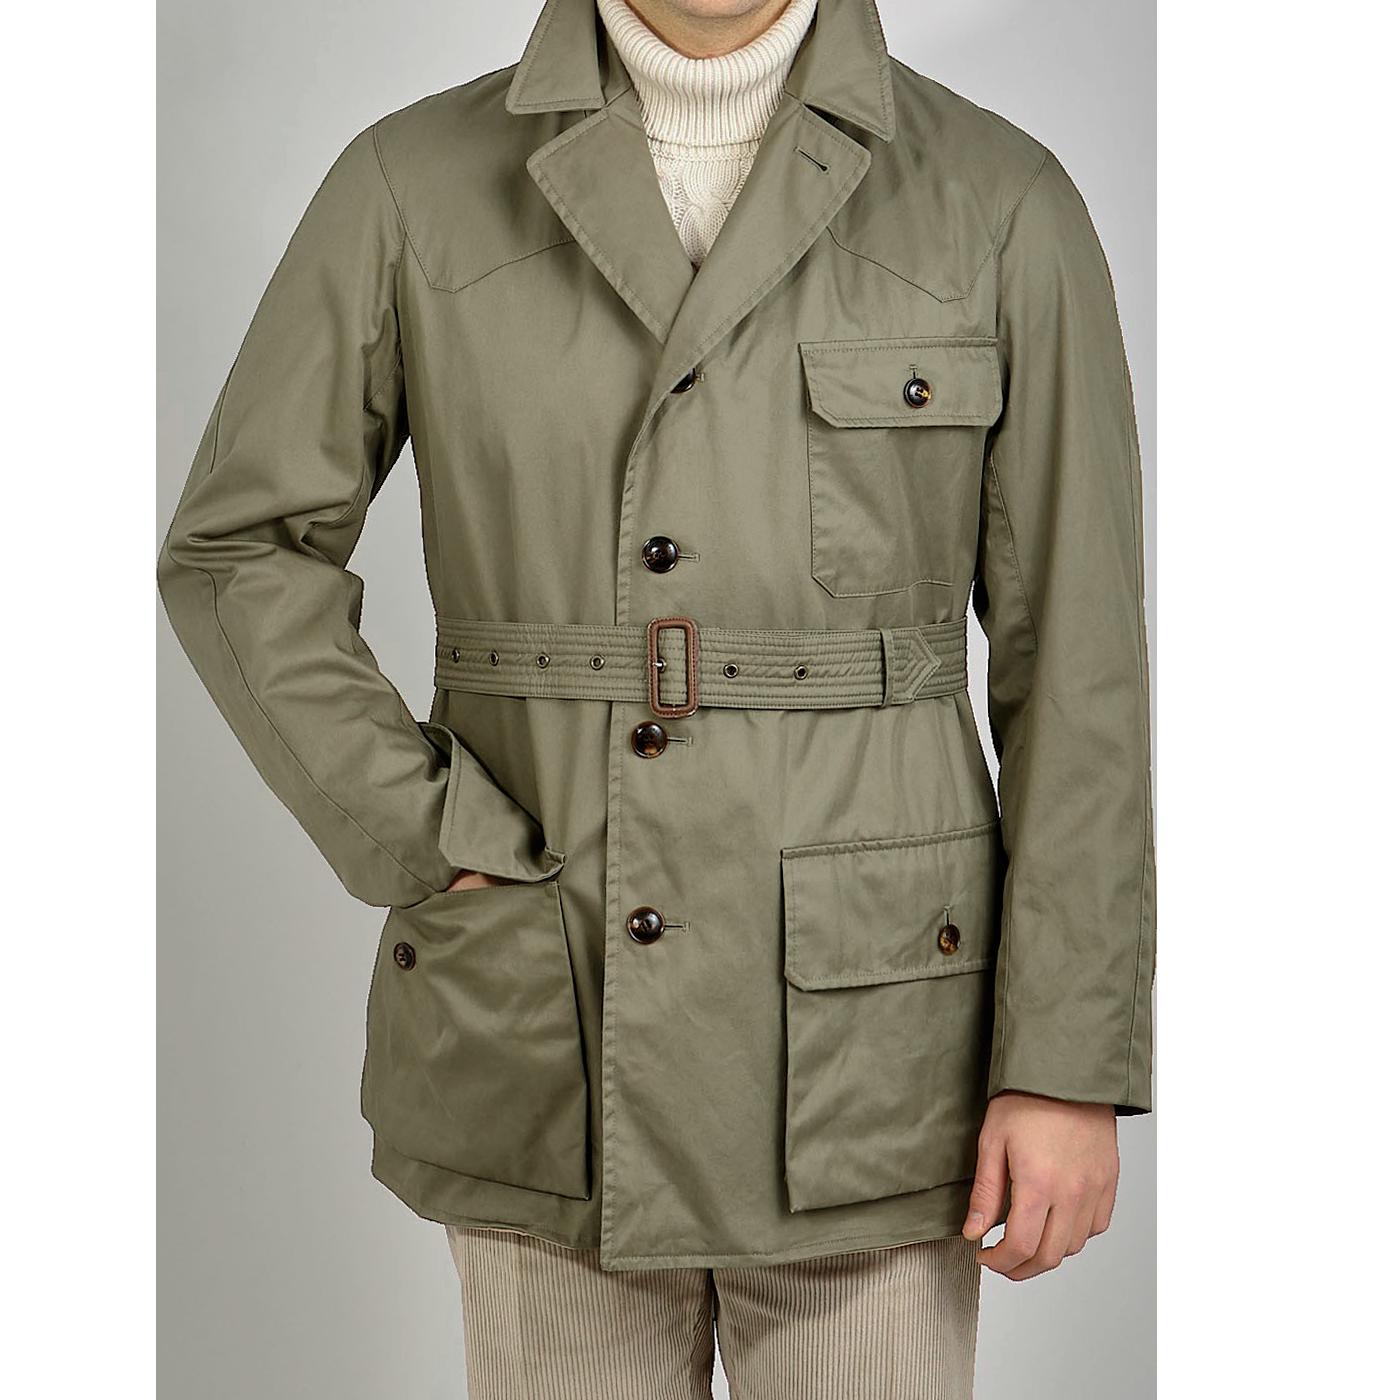 Grenfell Olive Green Cotton Gabardine Shooter Jacket Feature